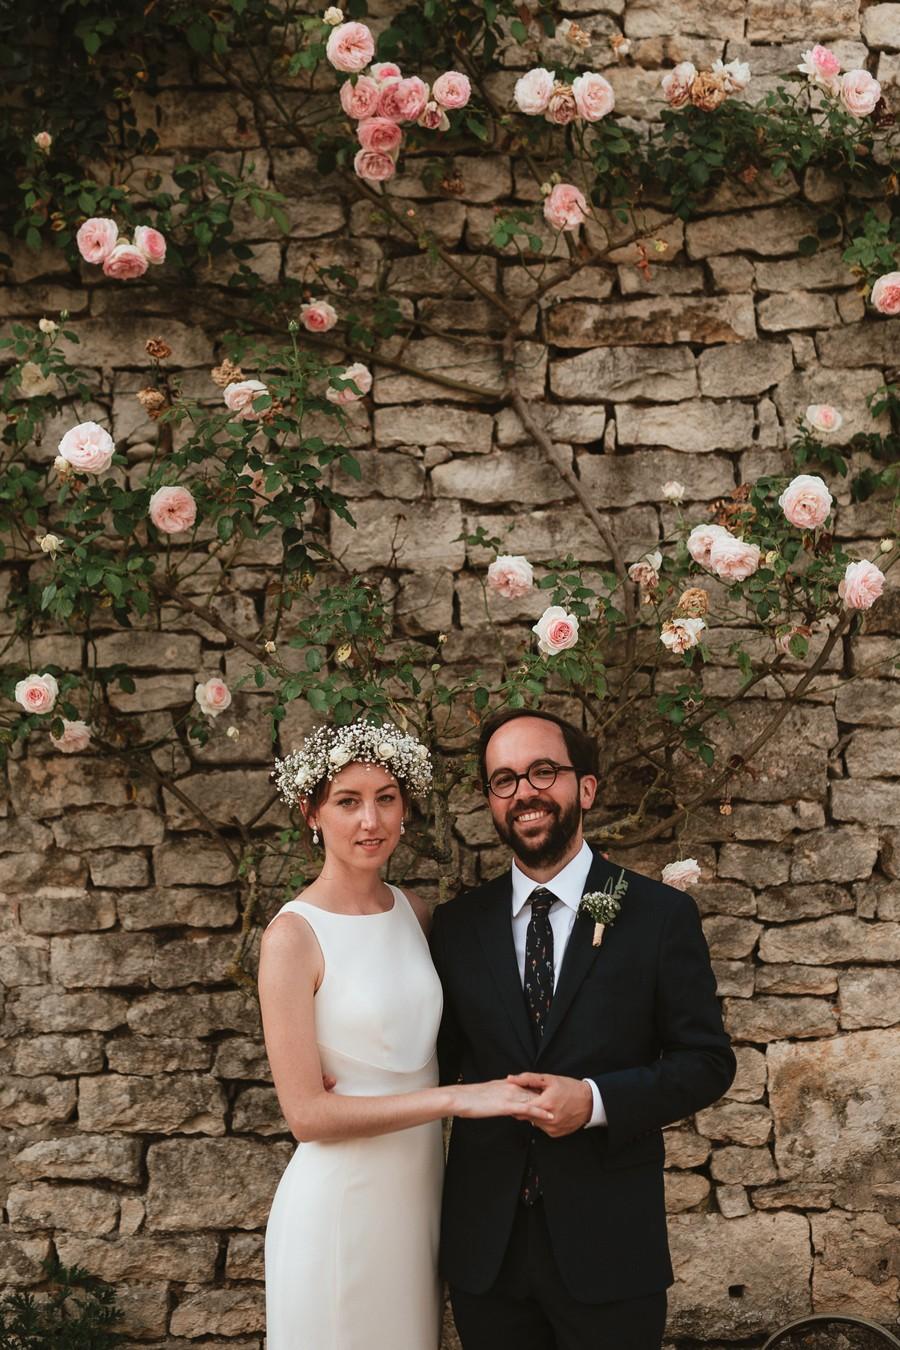 couple mariés rosier mur pierre